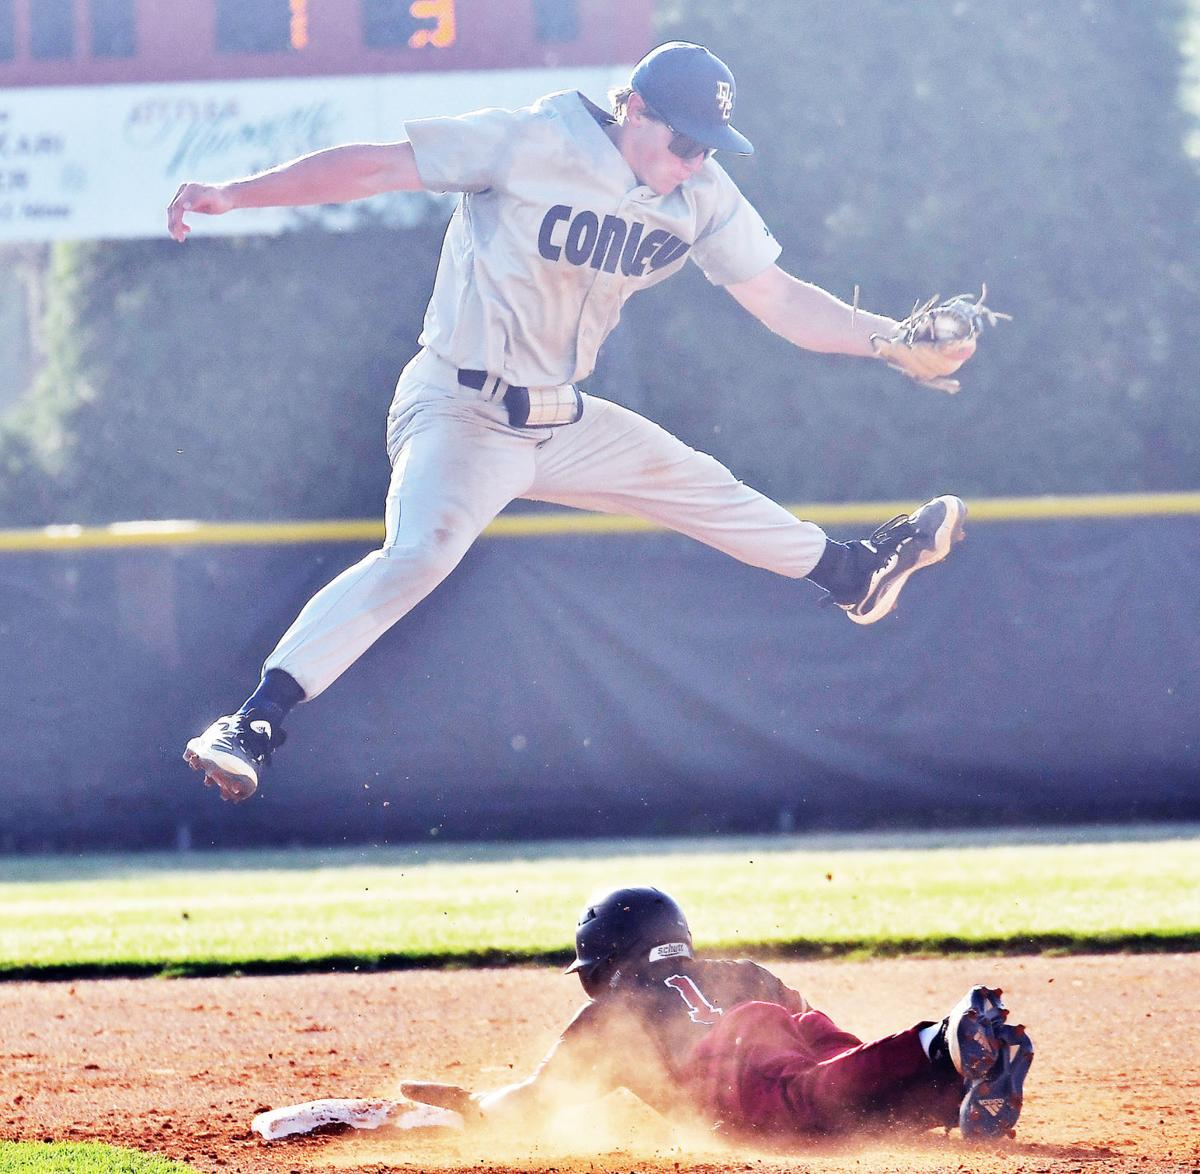 Conley baseball 2